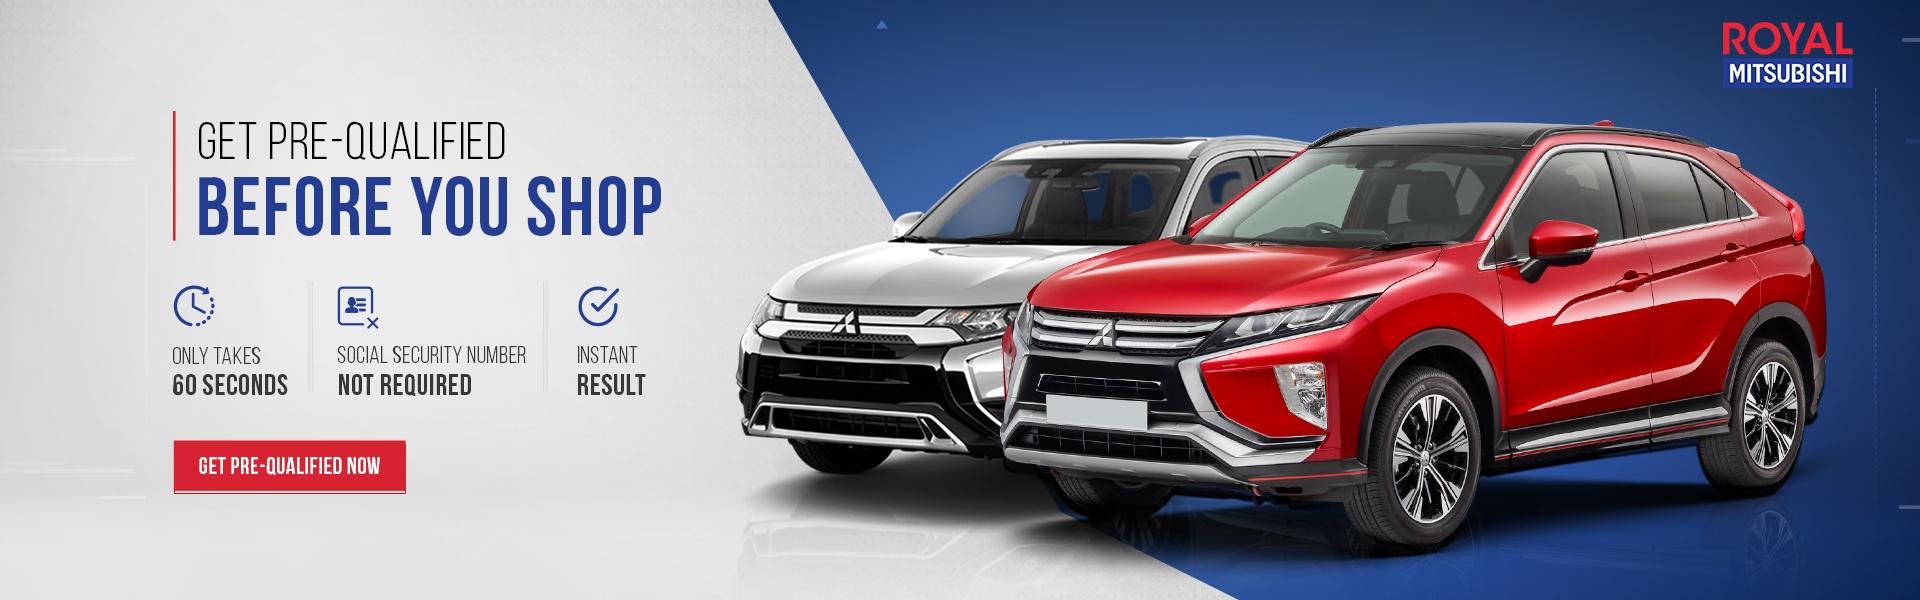 Royal Nissan Baton Rouge >> Royal Mitsubishi Mitsubishi Dealership In Baton Rouge La